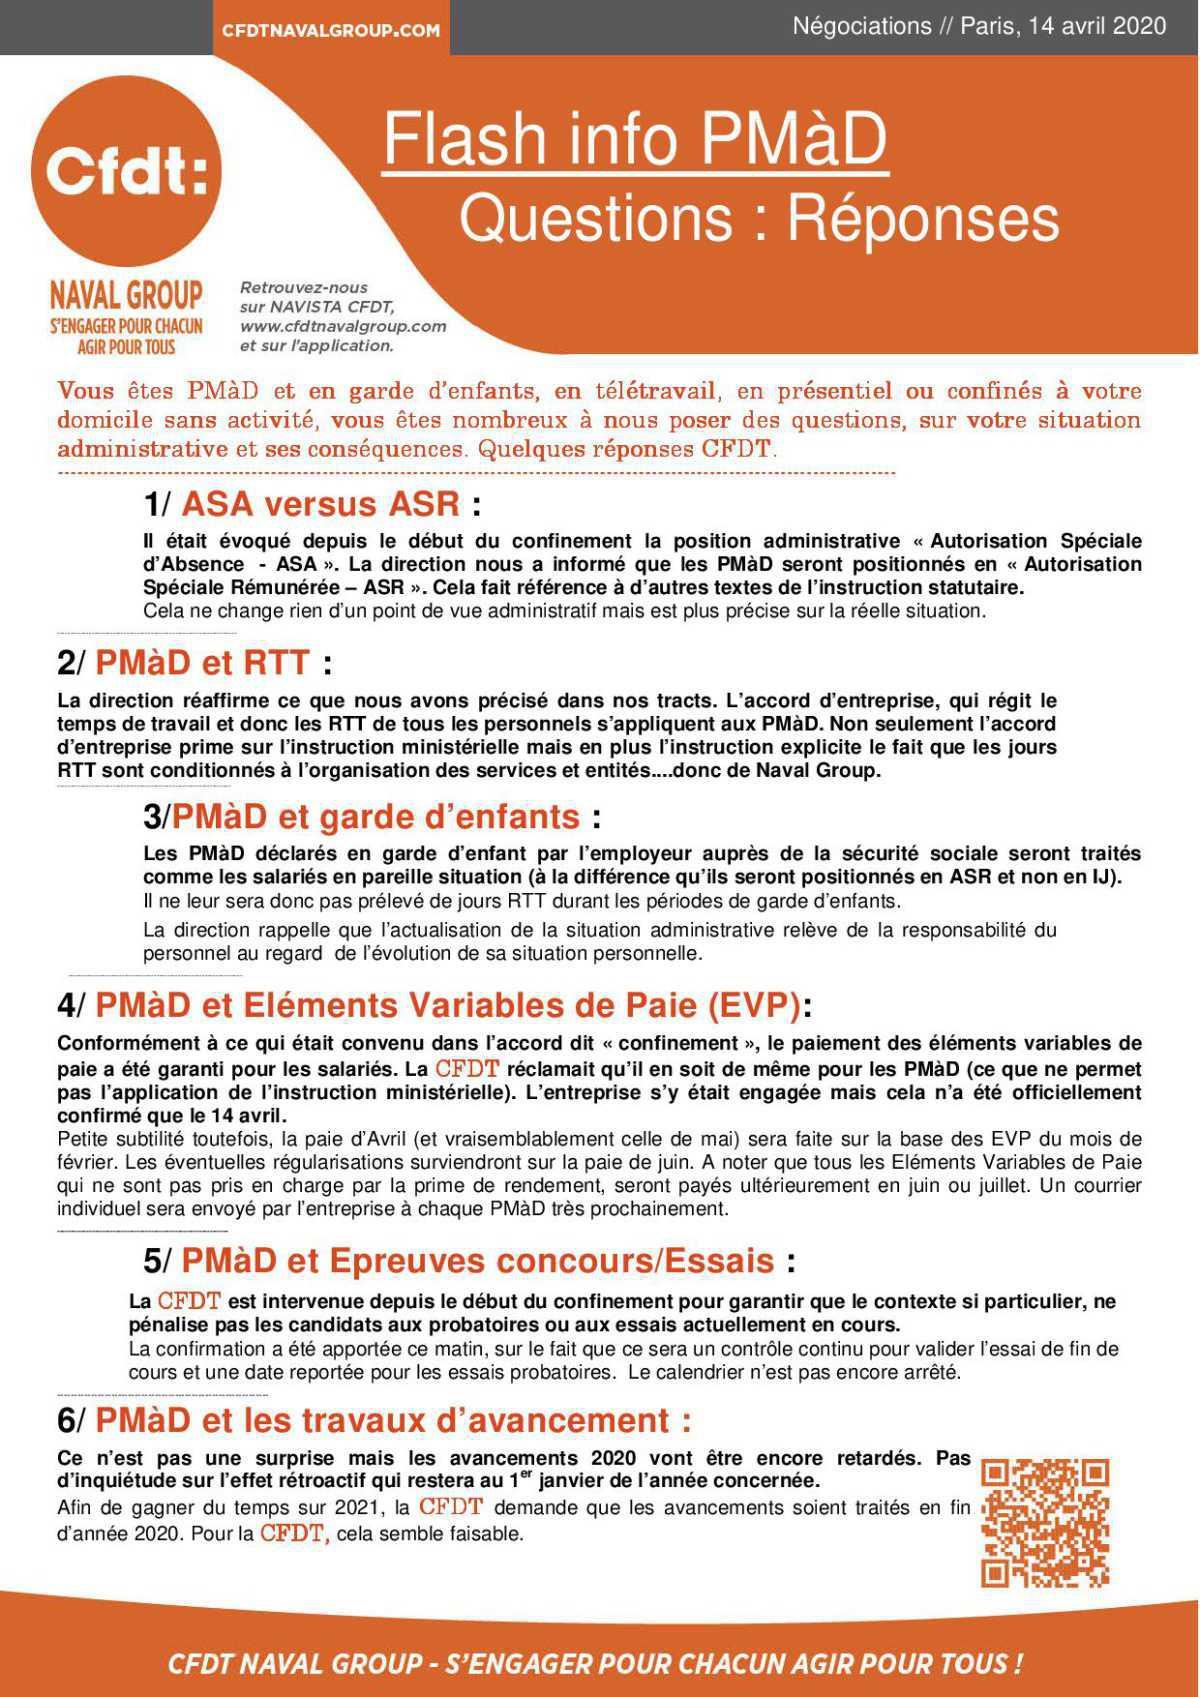 Flash Info PMAD